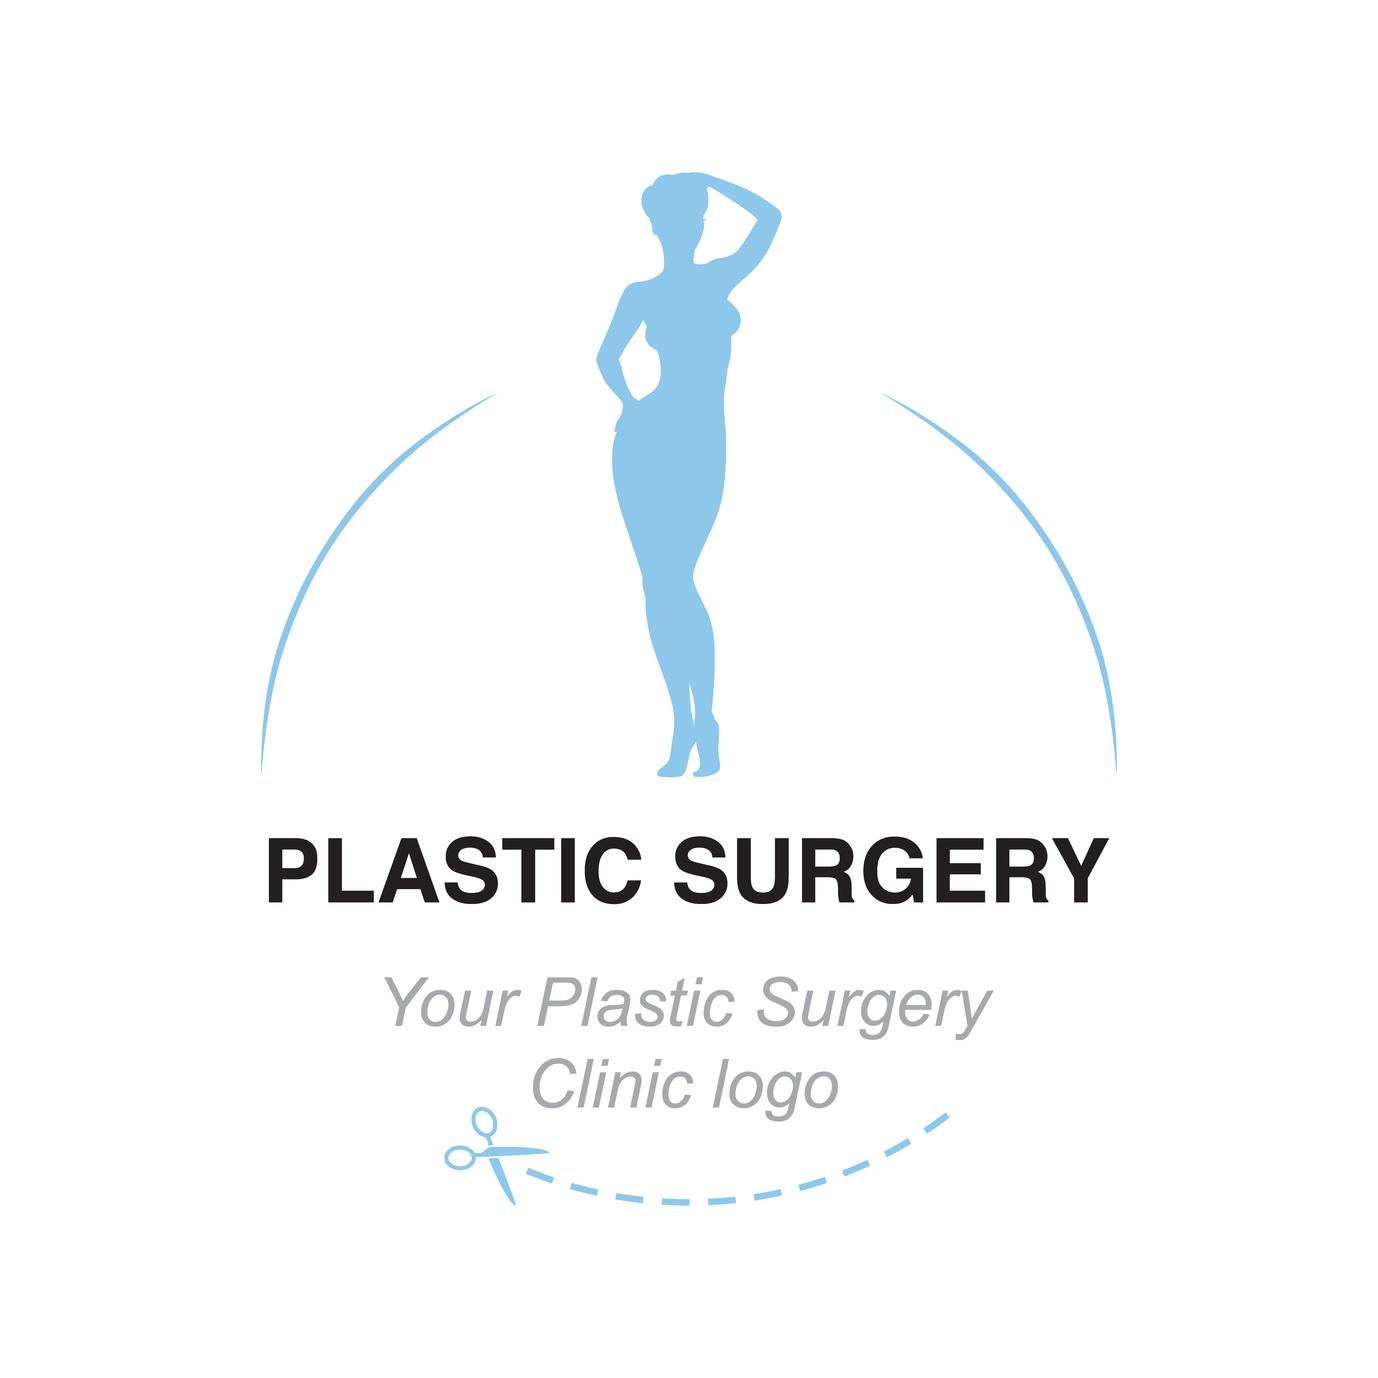 Cosmetic Surgery Logo Design The Future